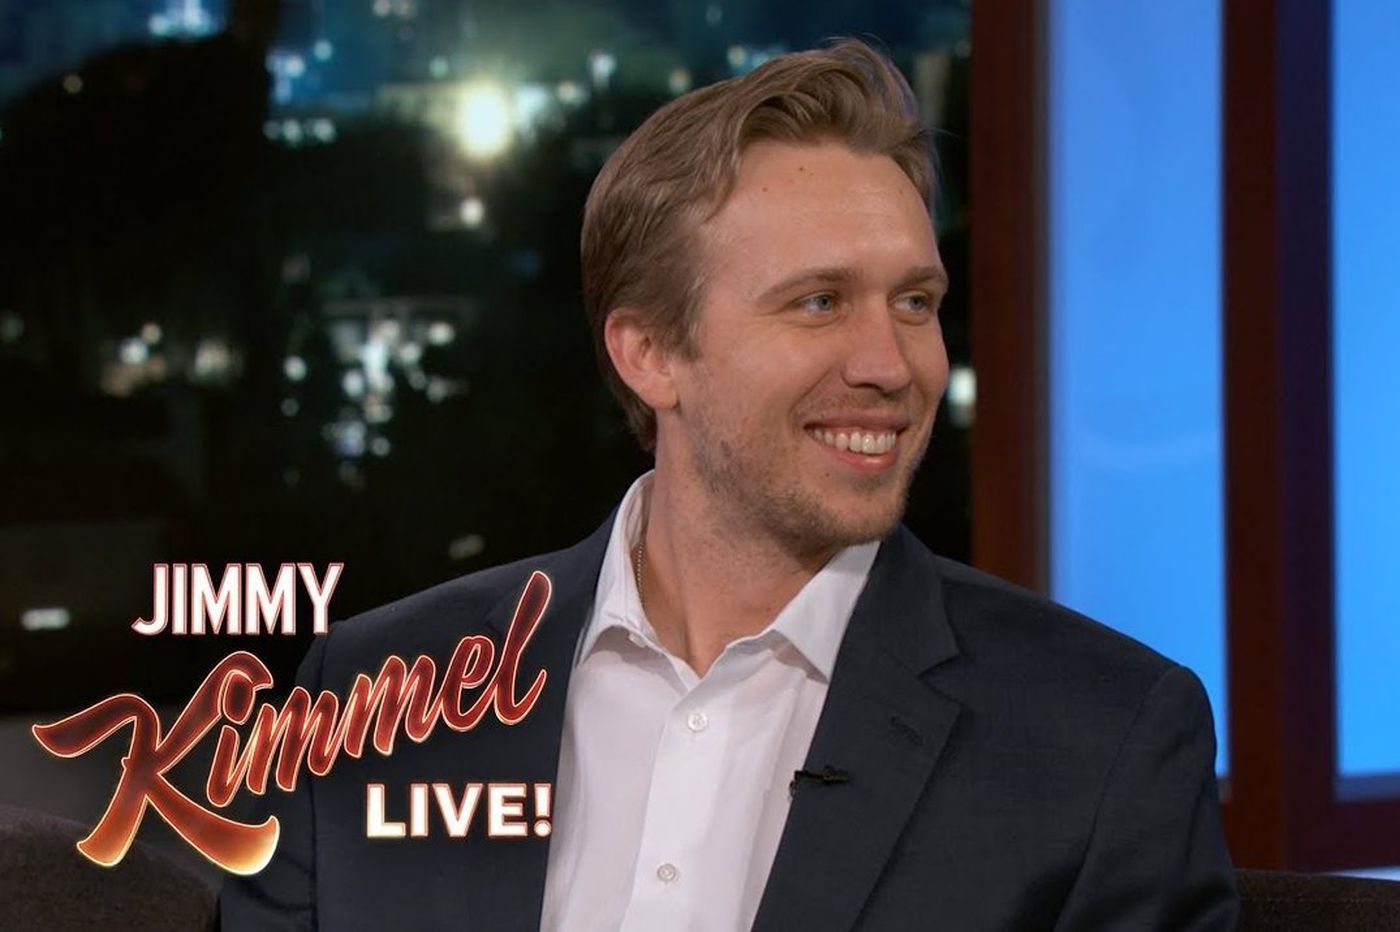 Nick Foles on 'Jimmy Kimmel': Tom Brady still hasn't spoken to me